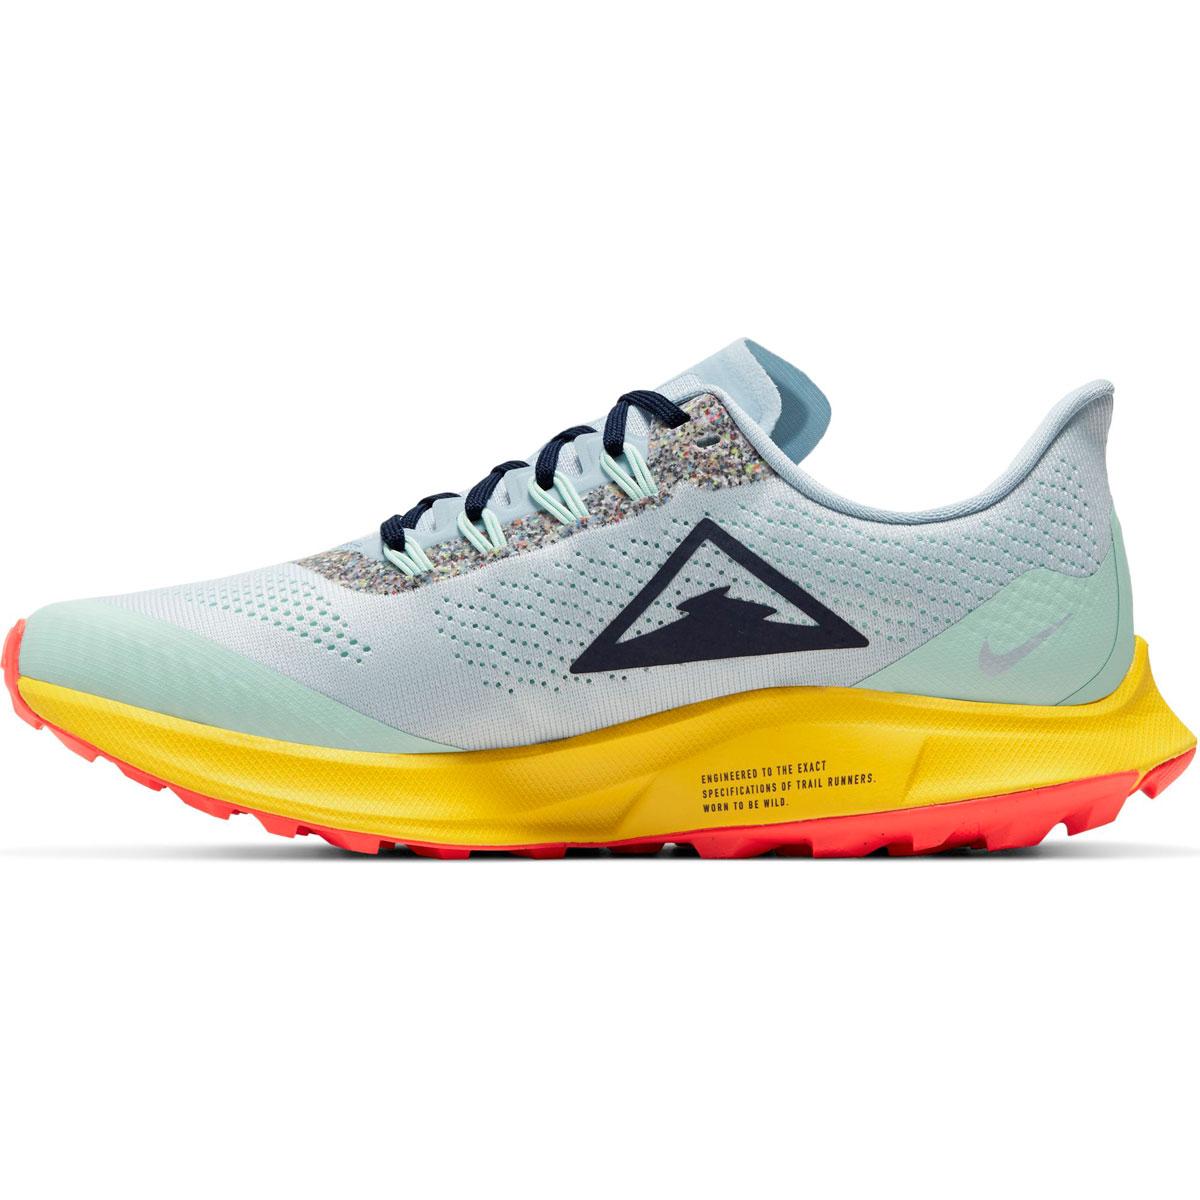 Women's Nike Air Zoom Pegasus 36 Trail Running Shoe - Color: Aura/Blackened Blue/Light Armory (Regular Width) - Size: 5, Aura/Blackened Blue/Light Armory, large, image 2